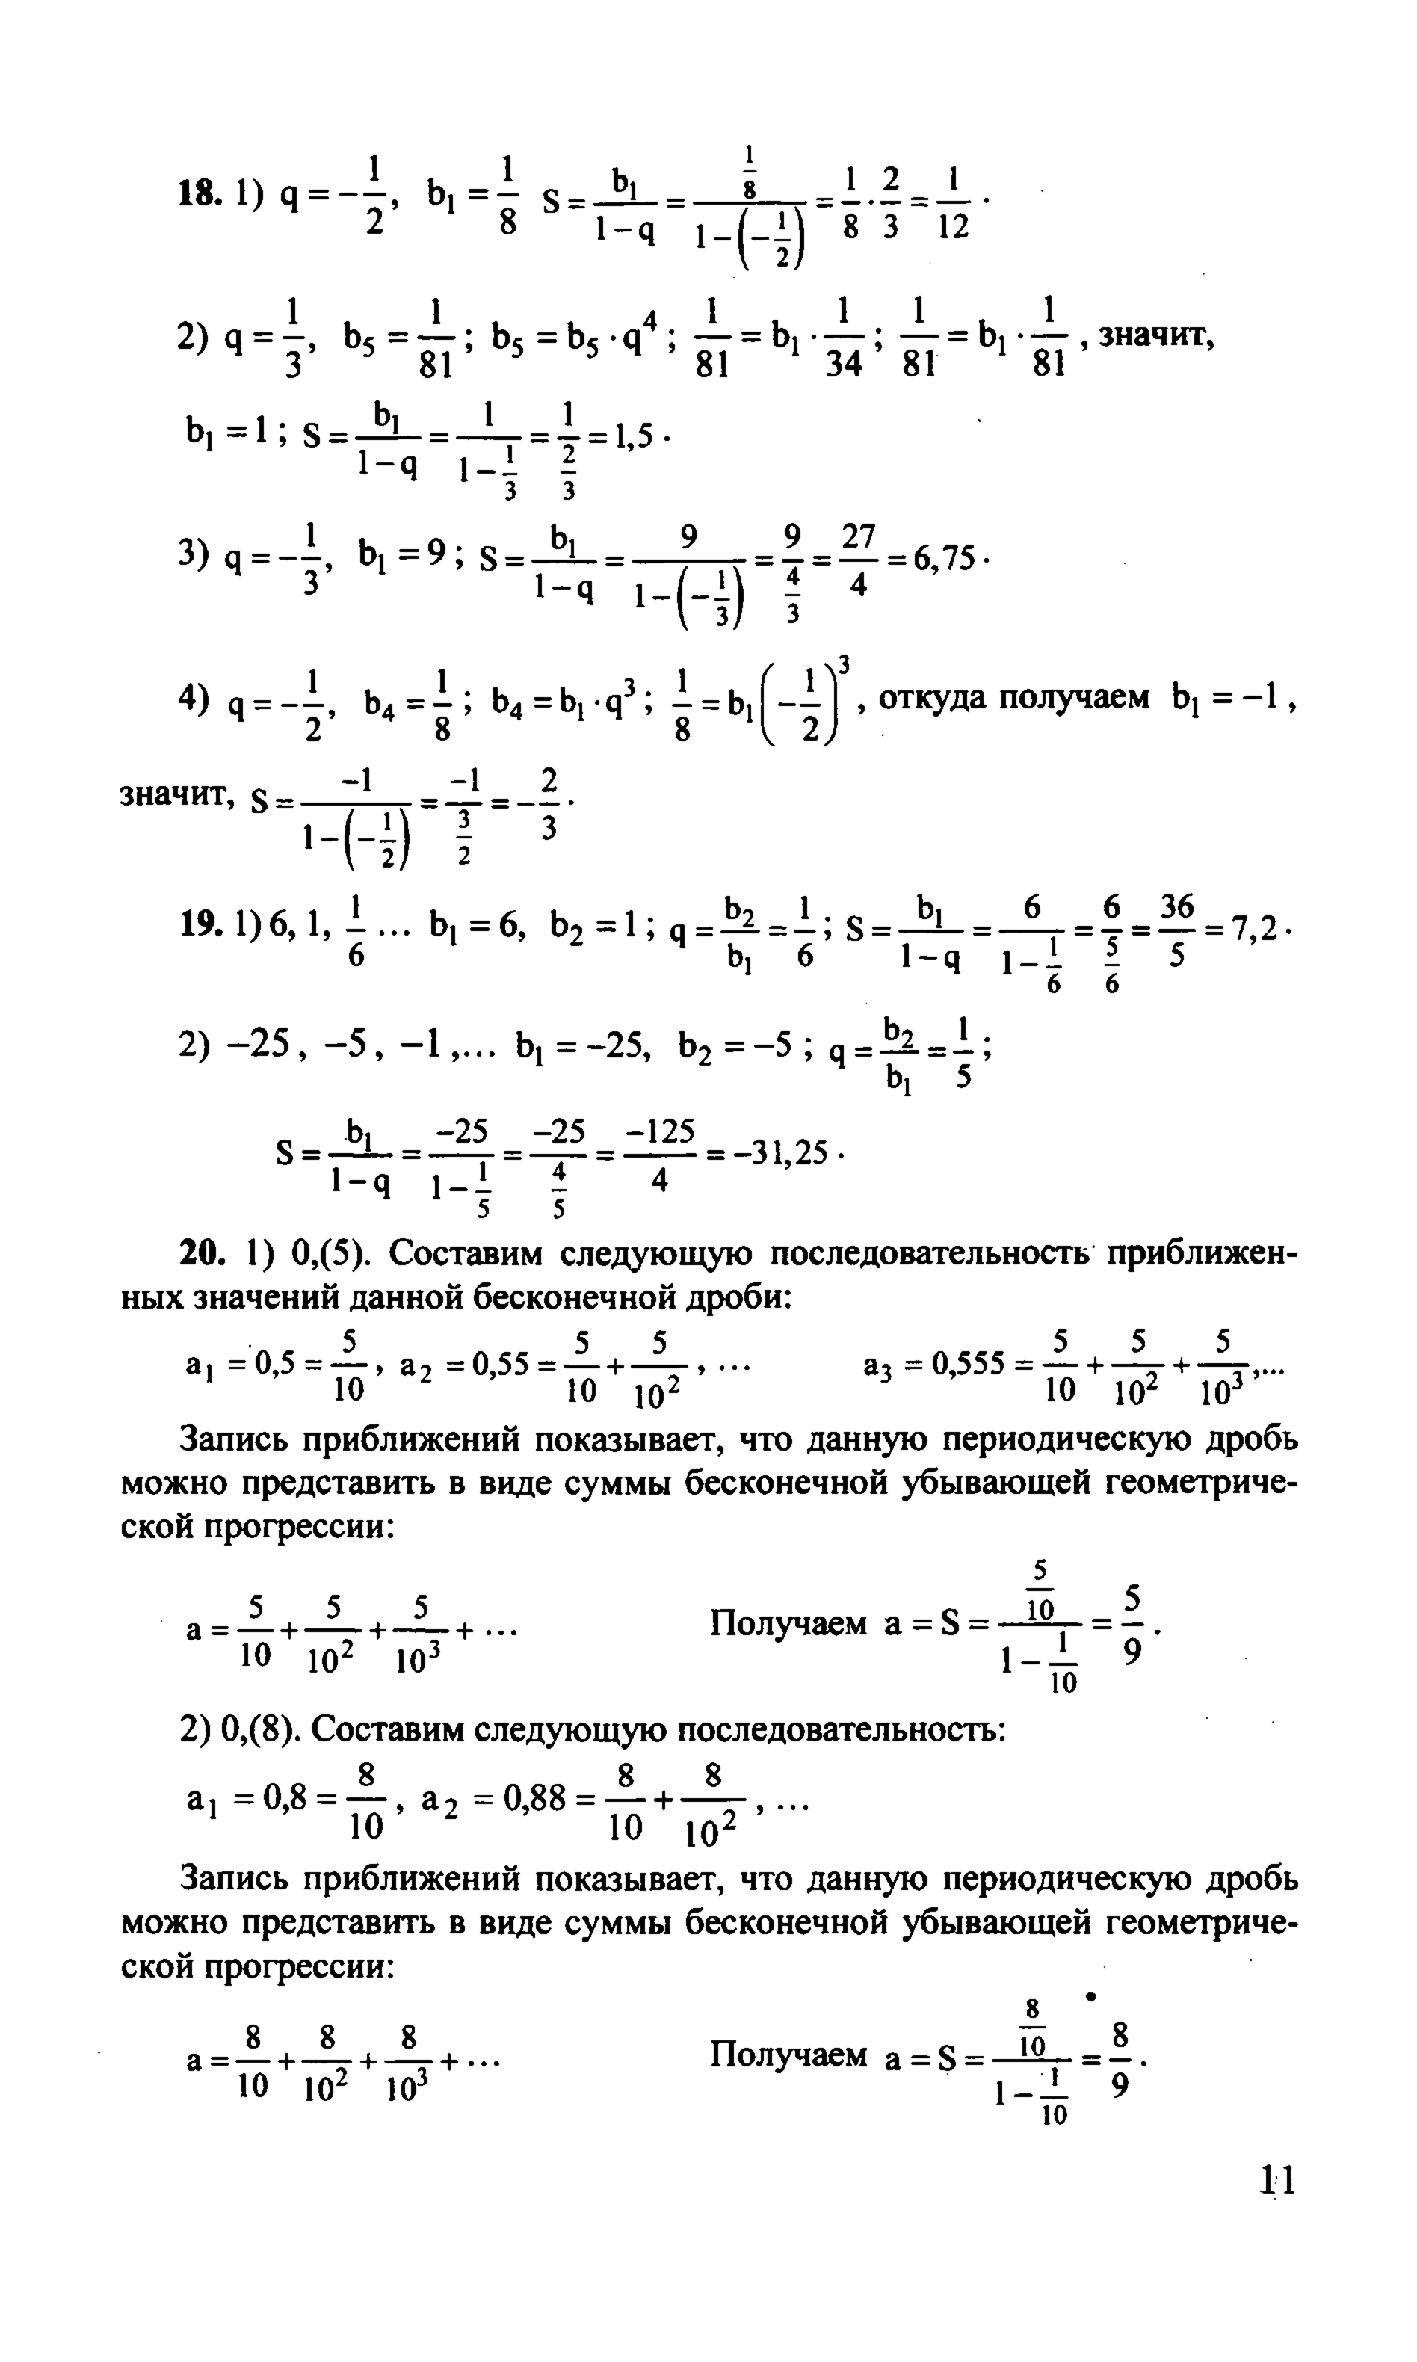 алгебра и начала анализа 11 класс абылкасымова ответы